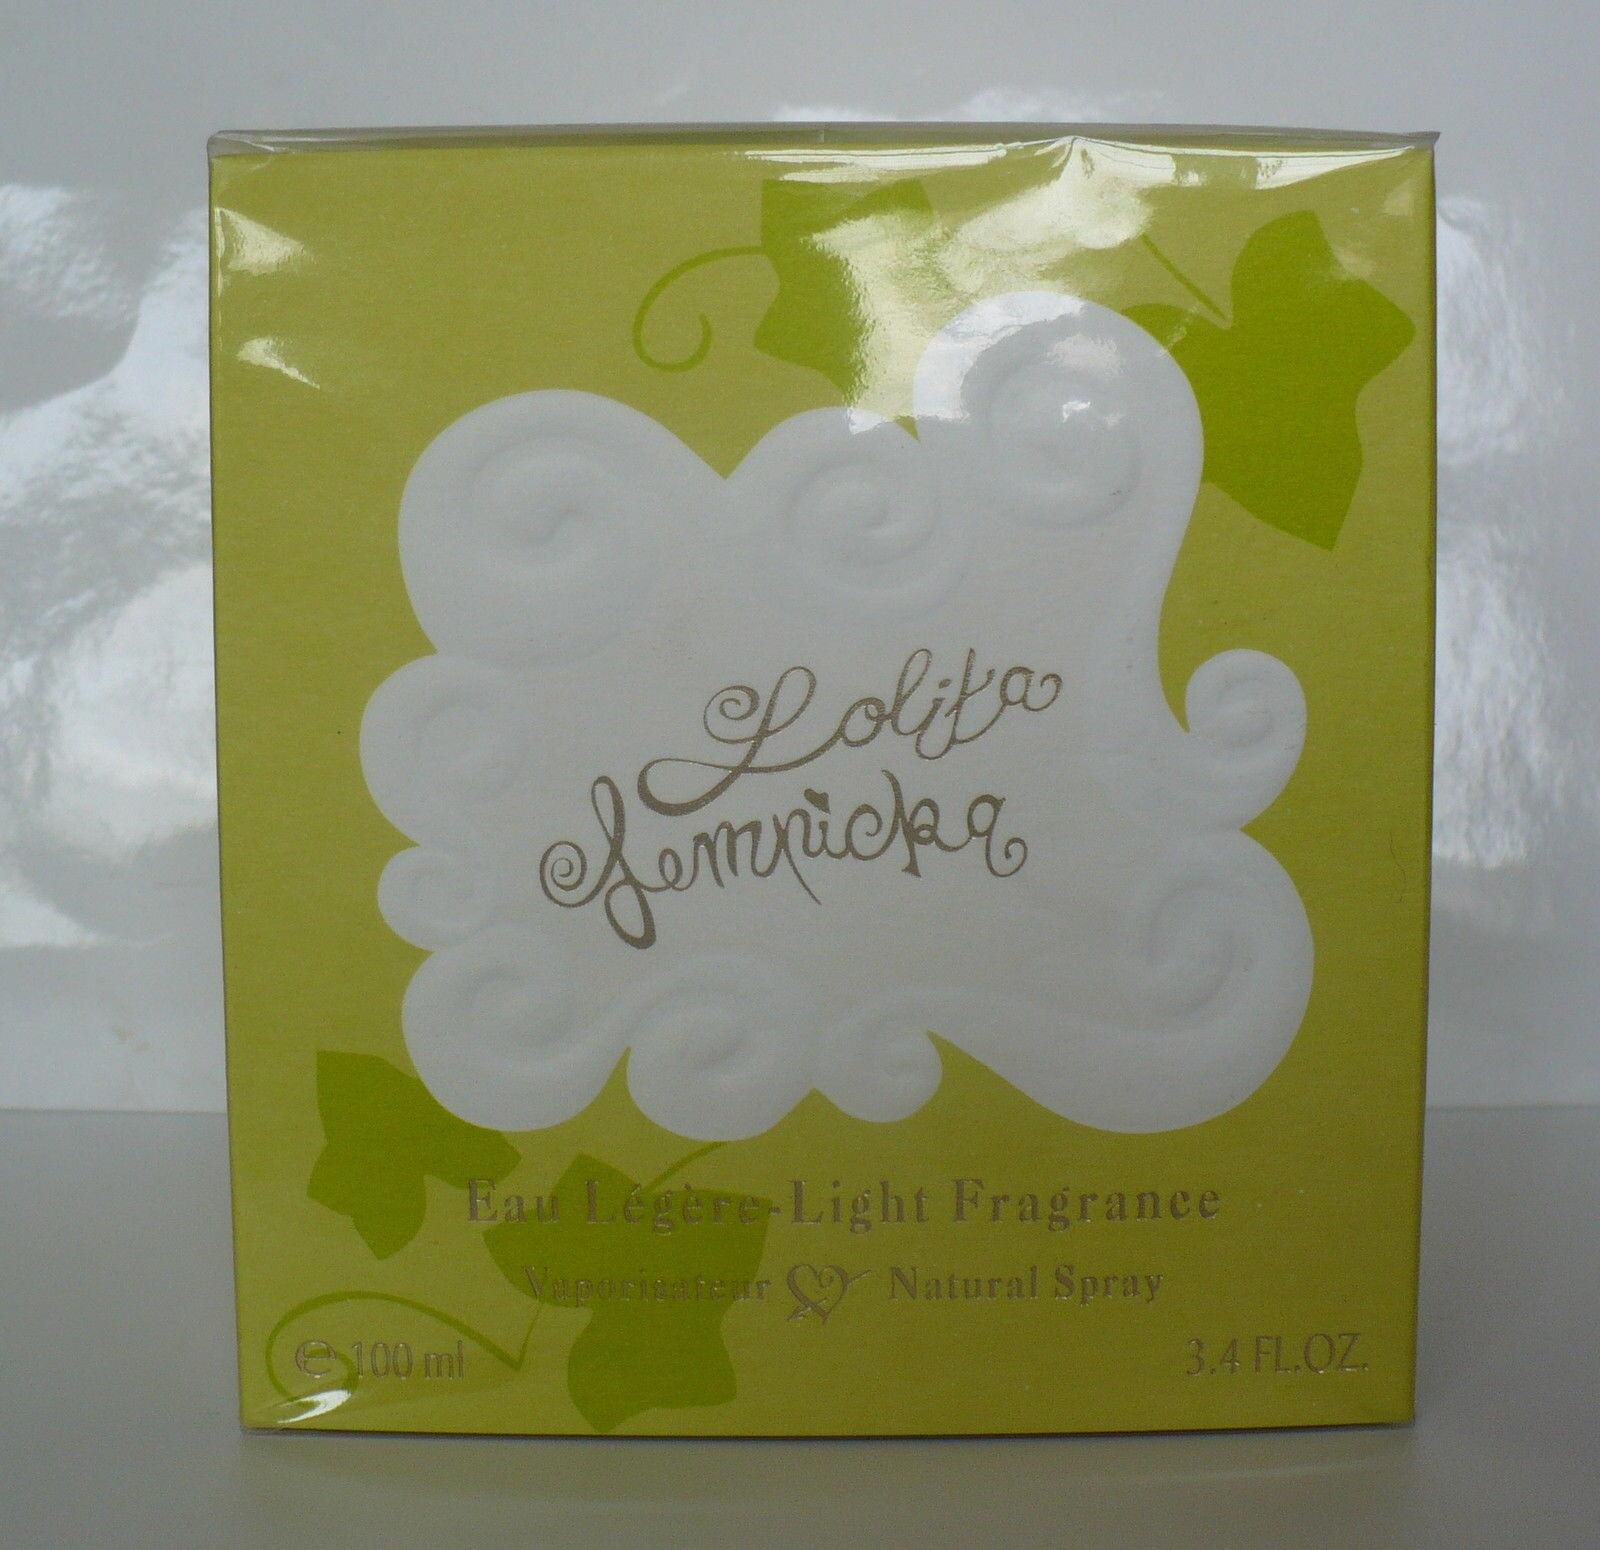 Lolita Lempicka Eau Legere Light Fragrance